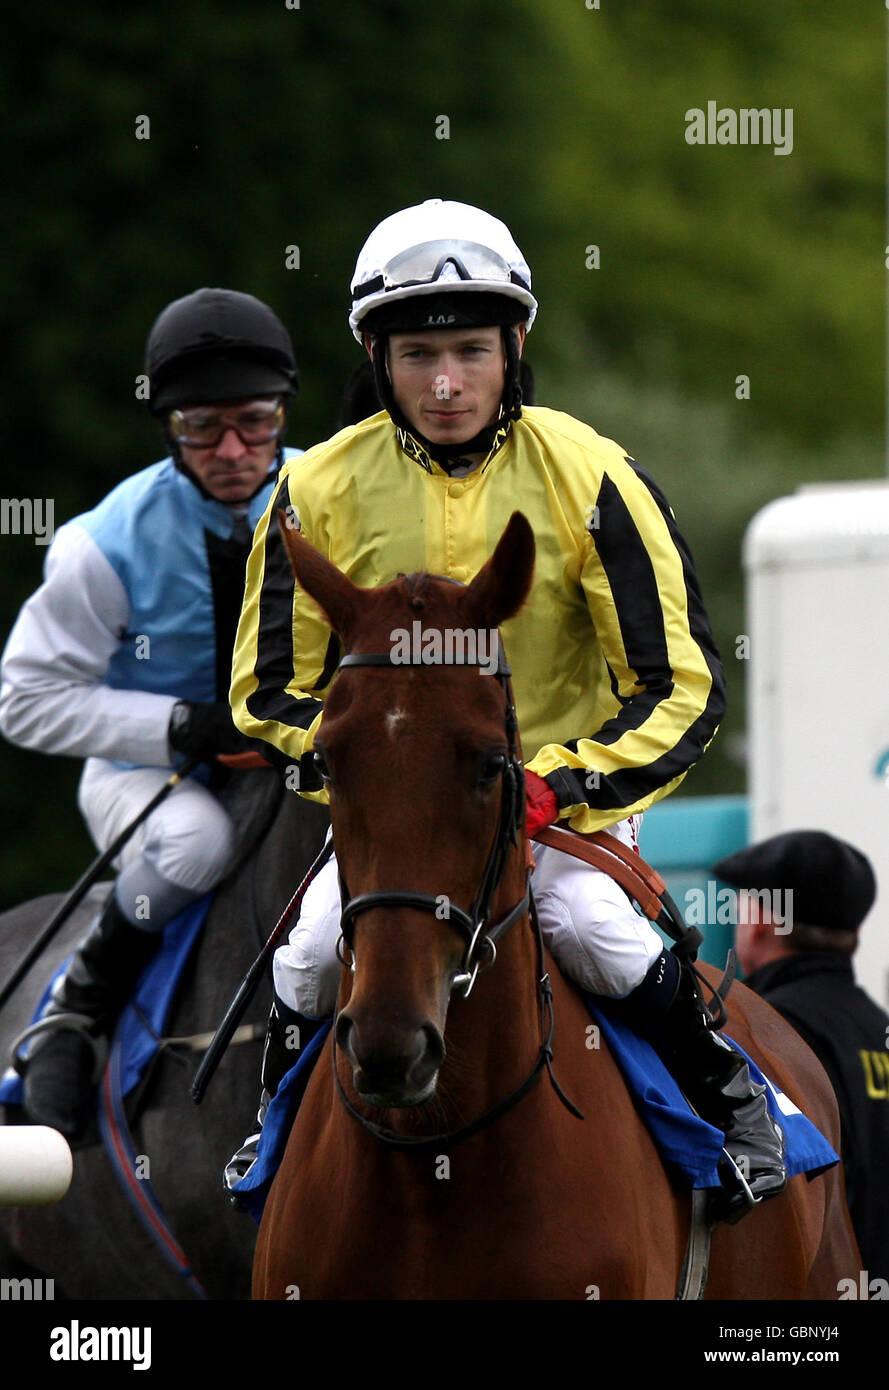 Horse Racing - Nottingham Racecourse - Stock Image